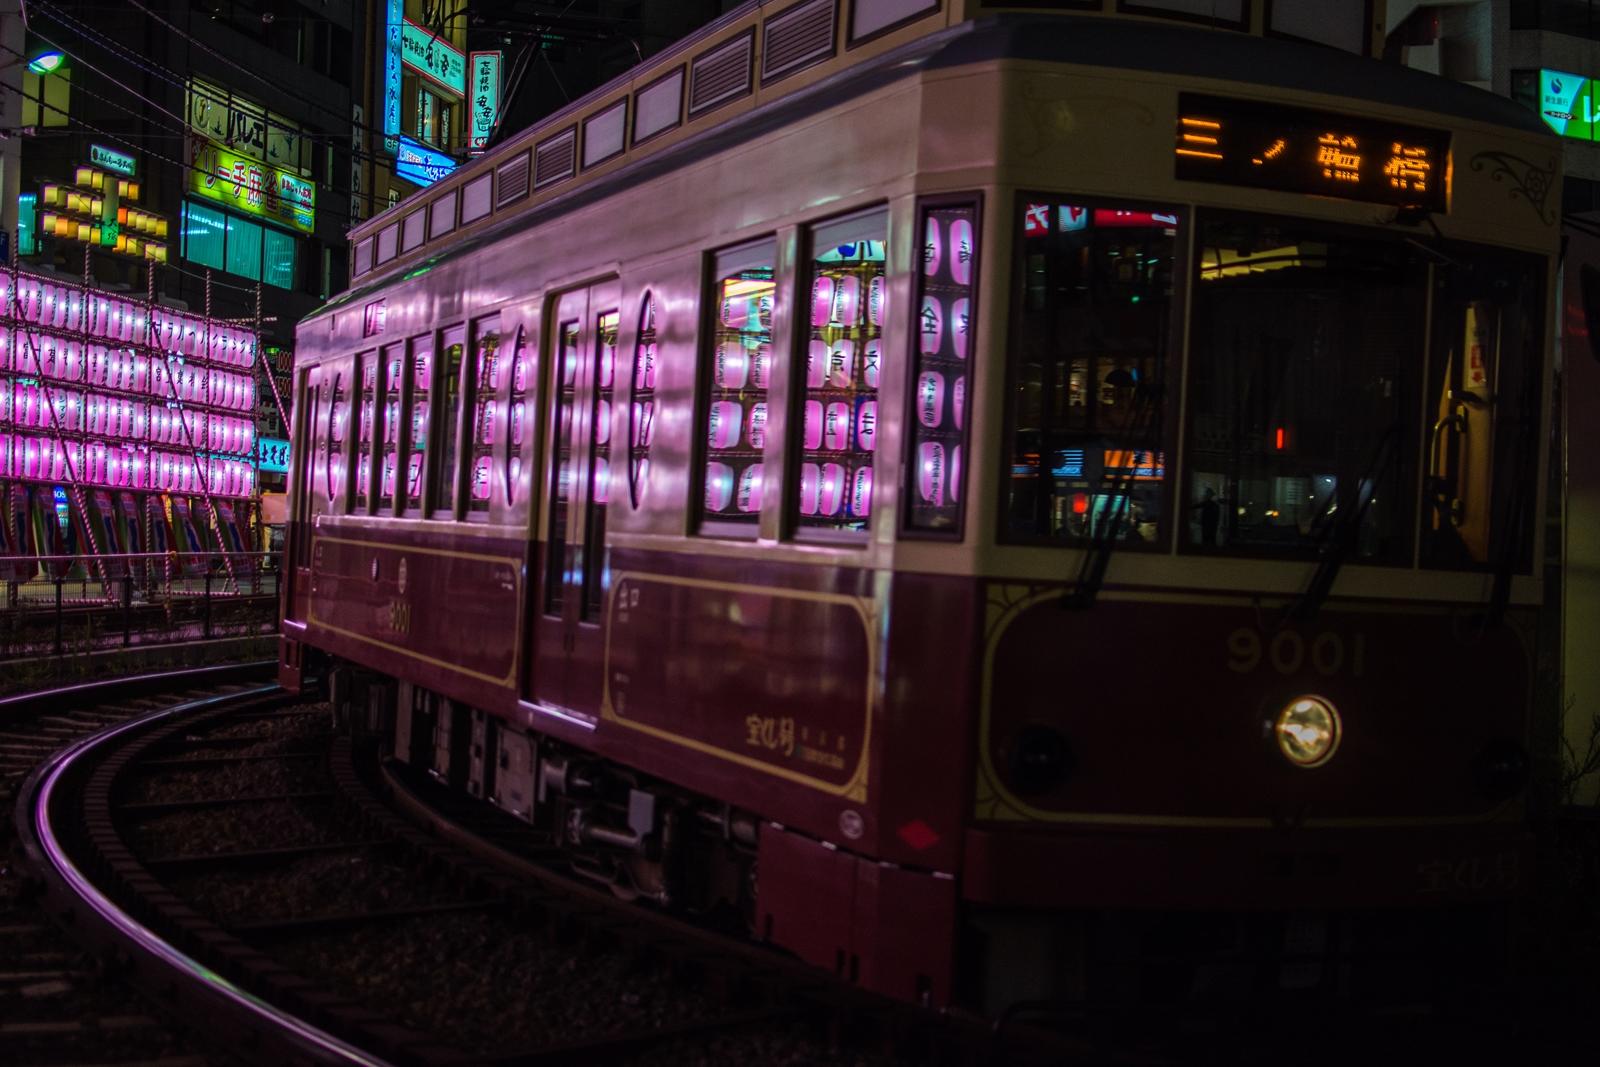 Photo: 祭りの街を抜ける Passes through the festival city.  お盆明けを迎えて 夏もどんどんと駆け抜けていきます。 荒川線の通る大塚の街でも 来週は阿波踊り まだまだ夏の熱いイベントを 楽しみたいものですね!  #cooljapan #nikon #train #night #festival Nikon D7200 Nikon AF-S DX NIKKOR 35mm f/1.8G